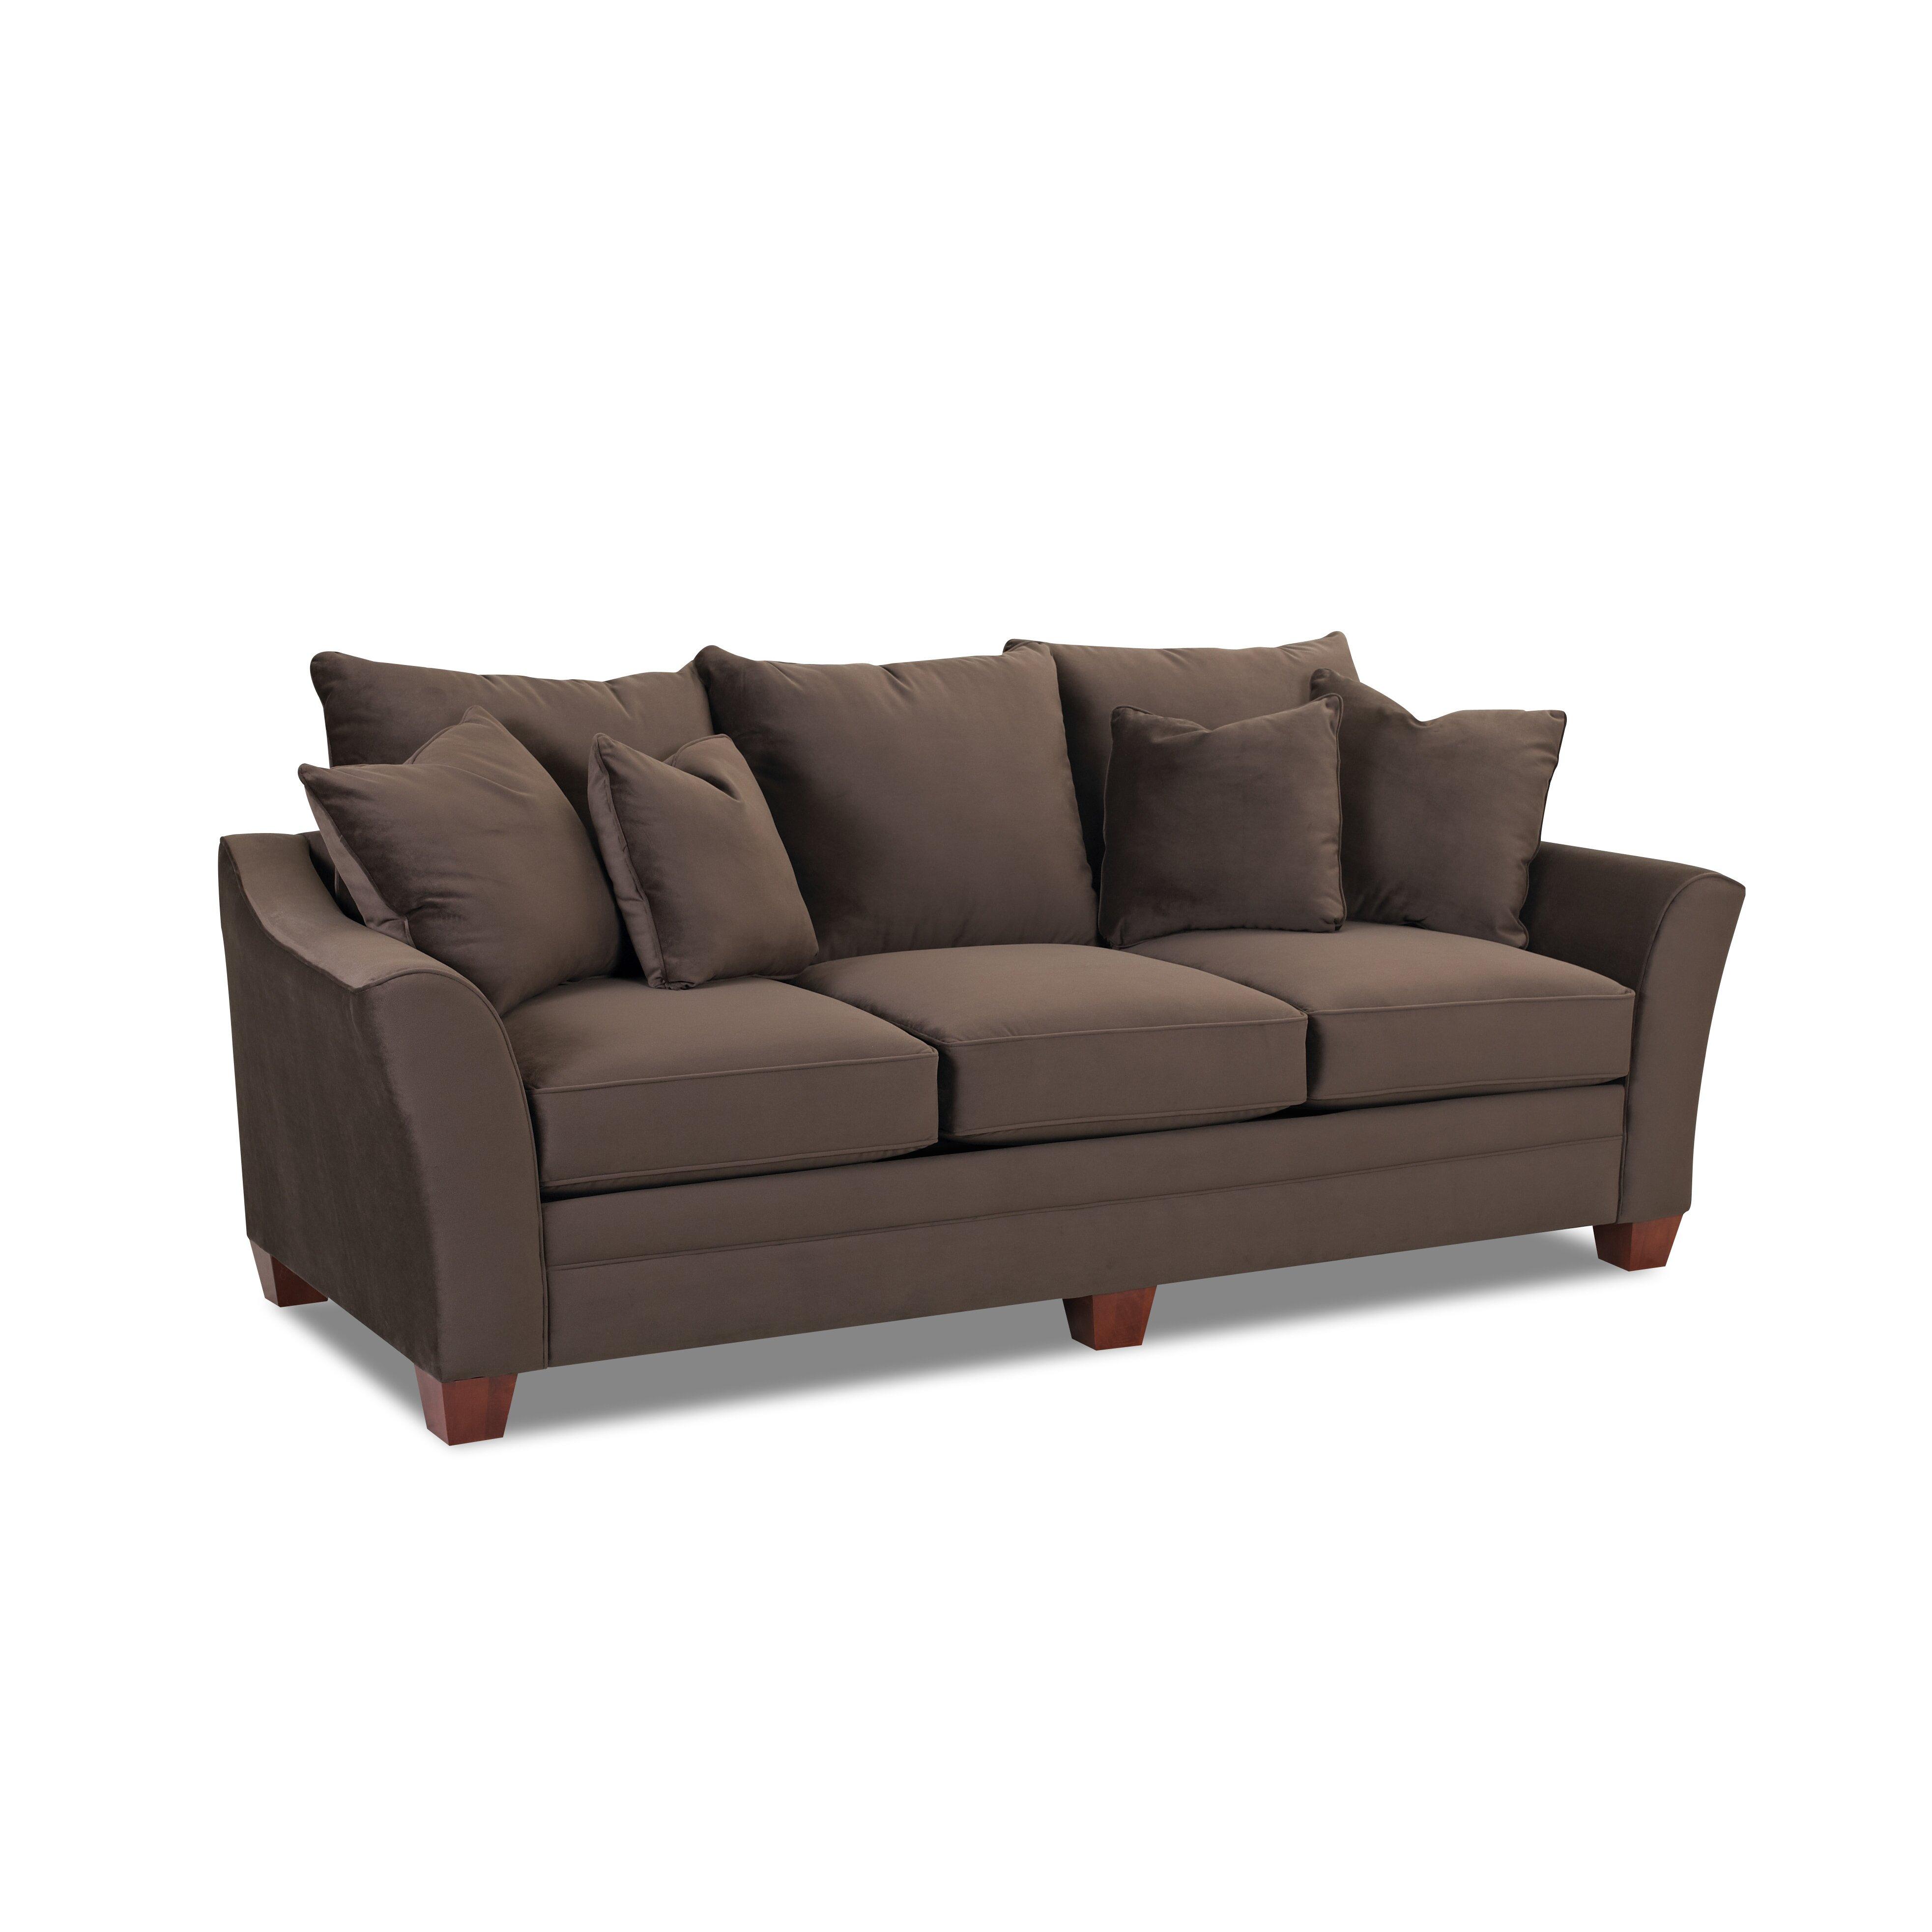 Darby Home Co Moffet Sofa Wayfair